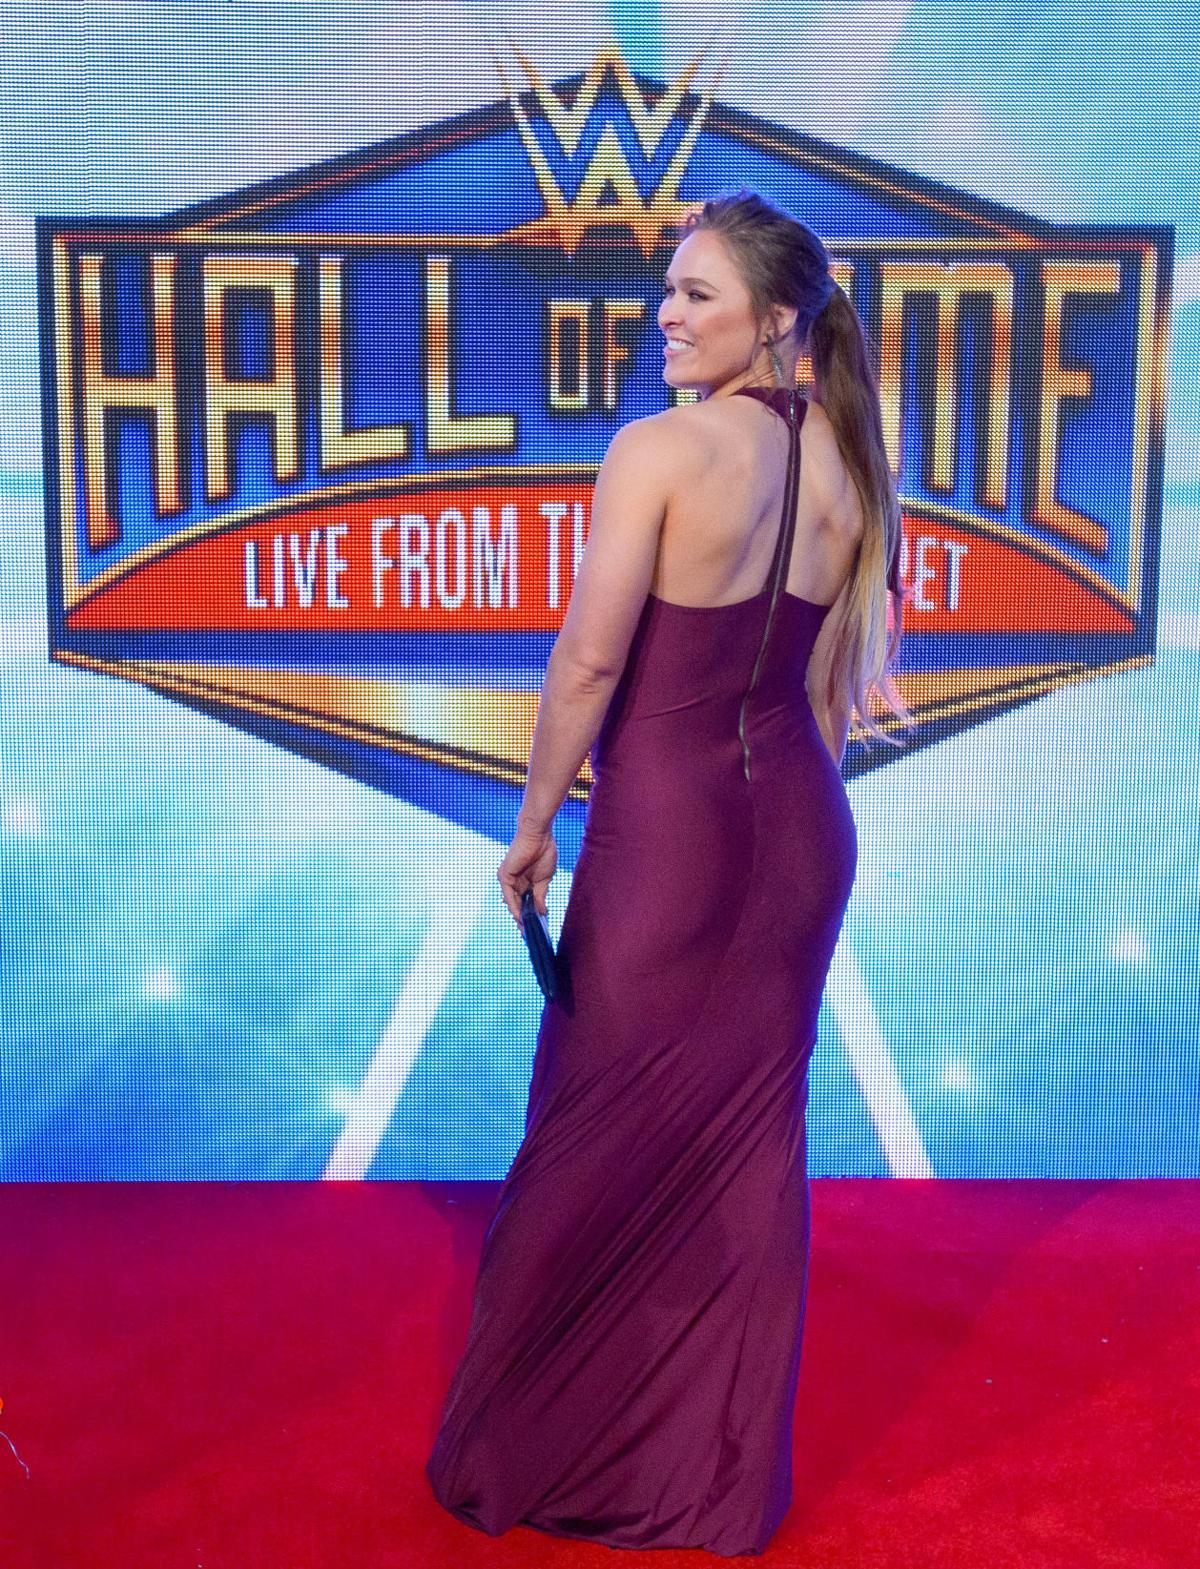 The Ronda Rousey Megathread Wrestling Forum Wwe Impact